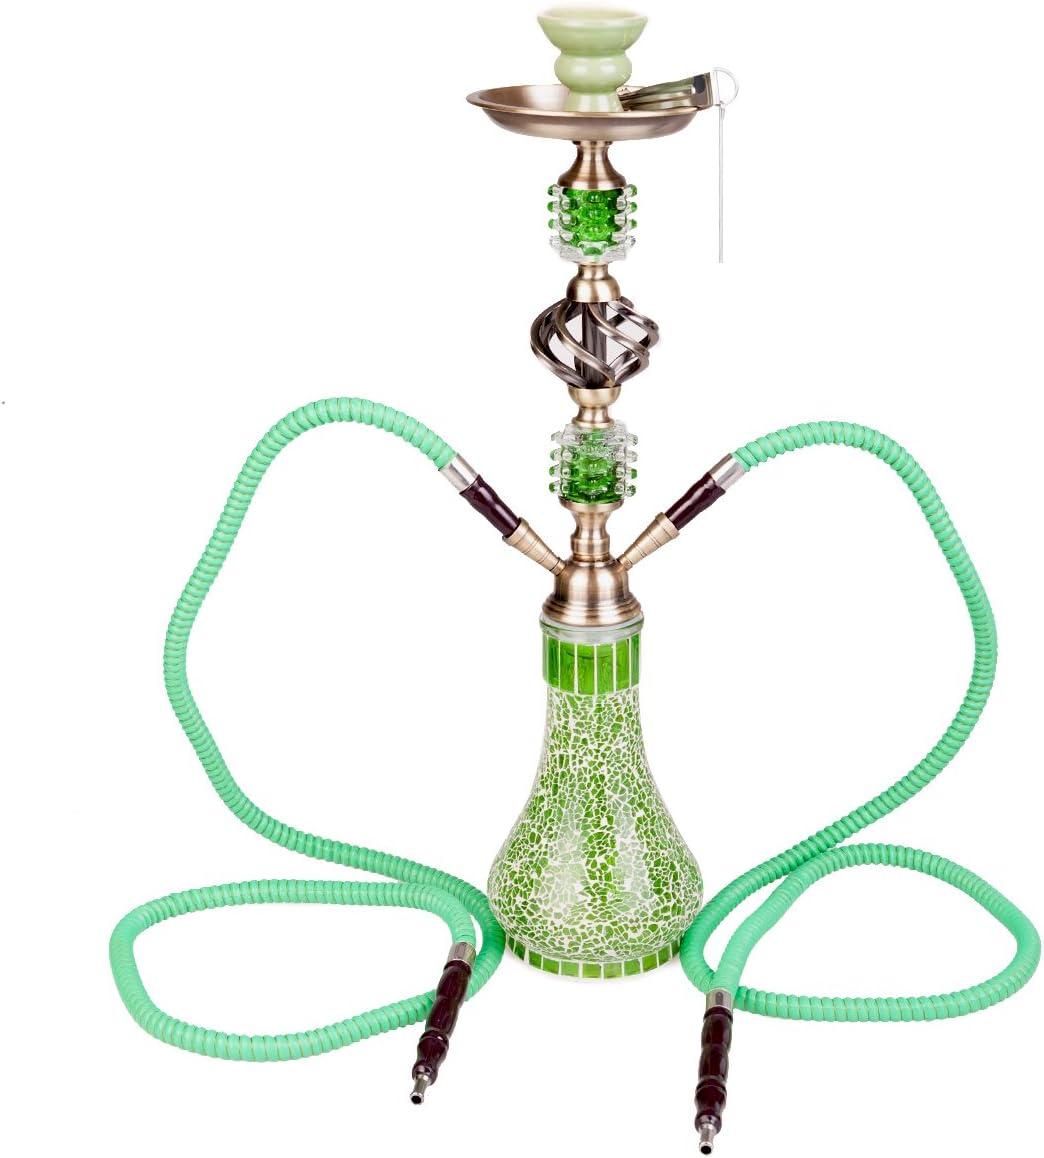 Ketou Cachimba Pipa de Agua Shisha hookah 2 Tubos Mangueras 55cm de altura Waterpipe (Verde)